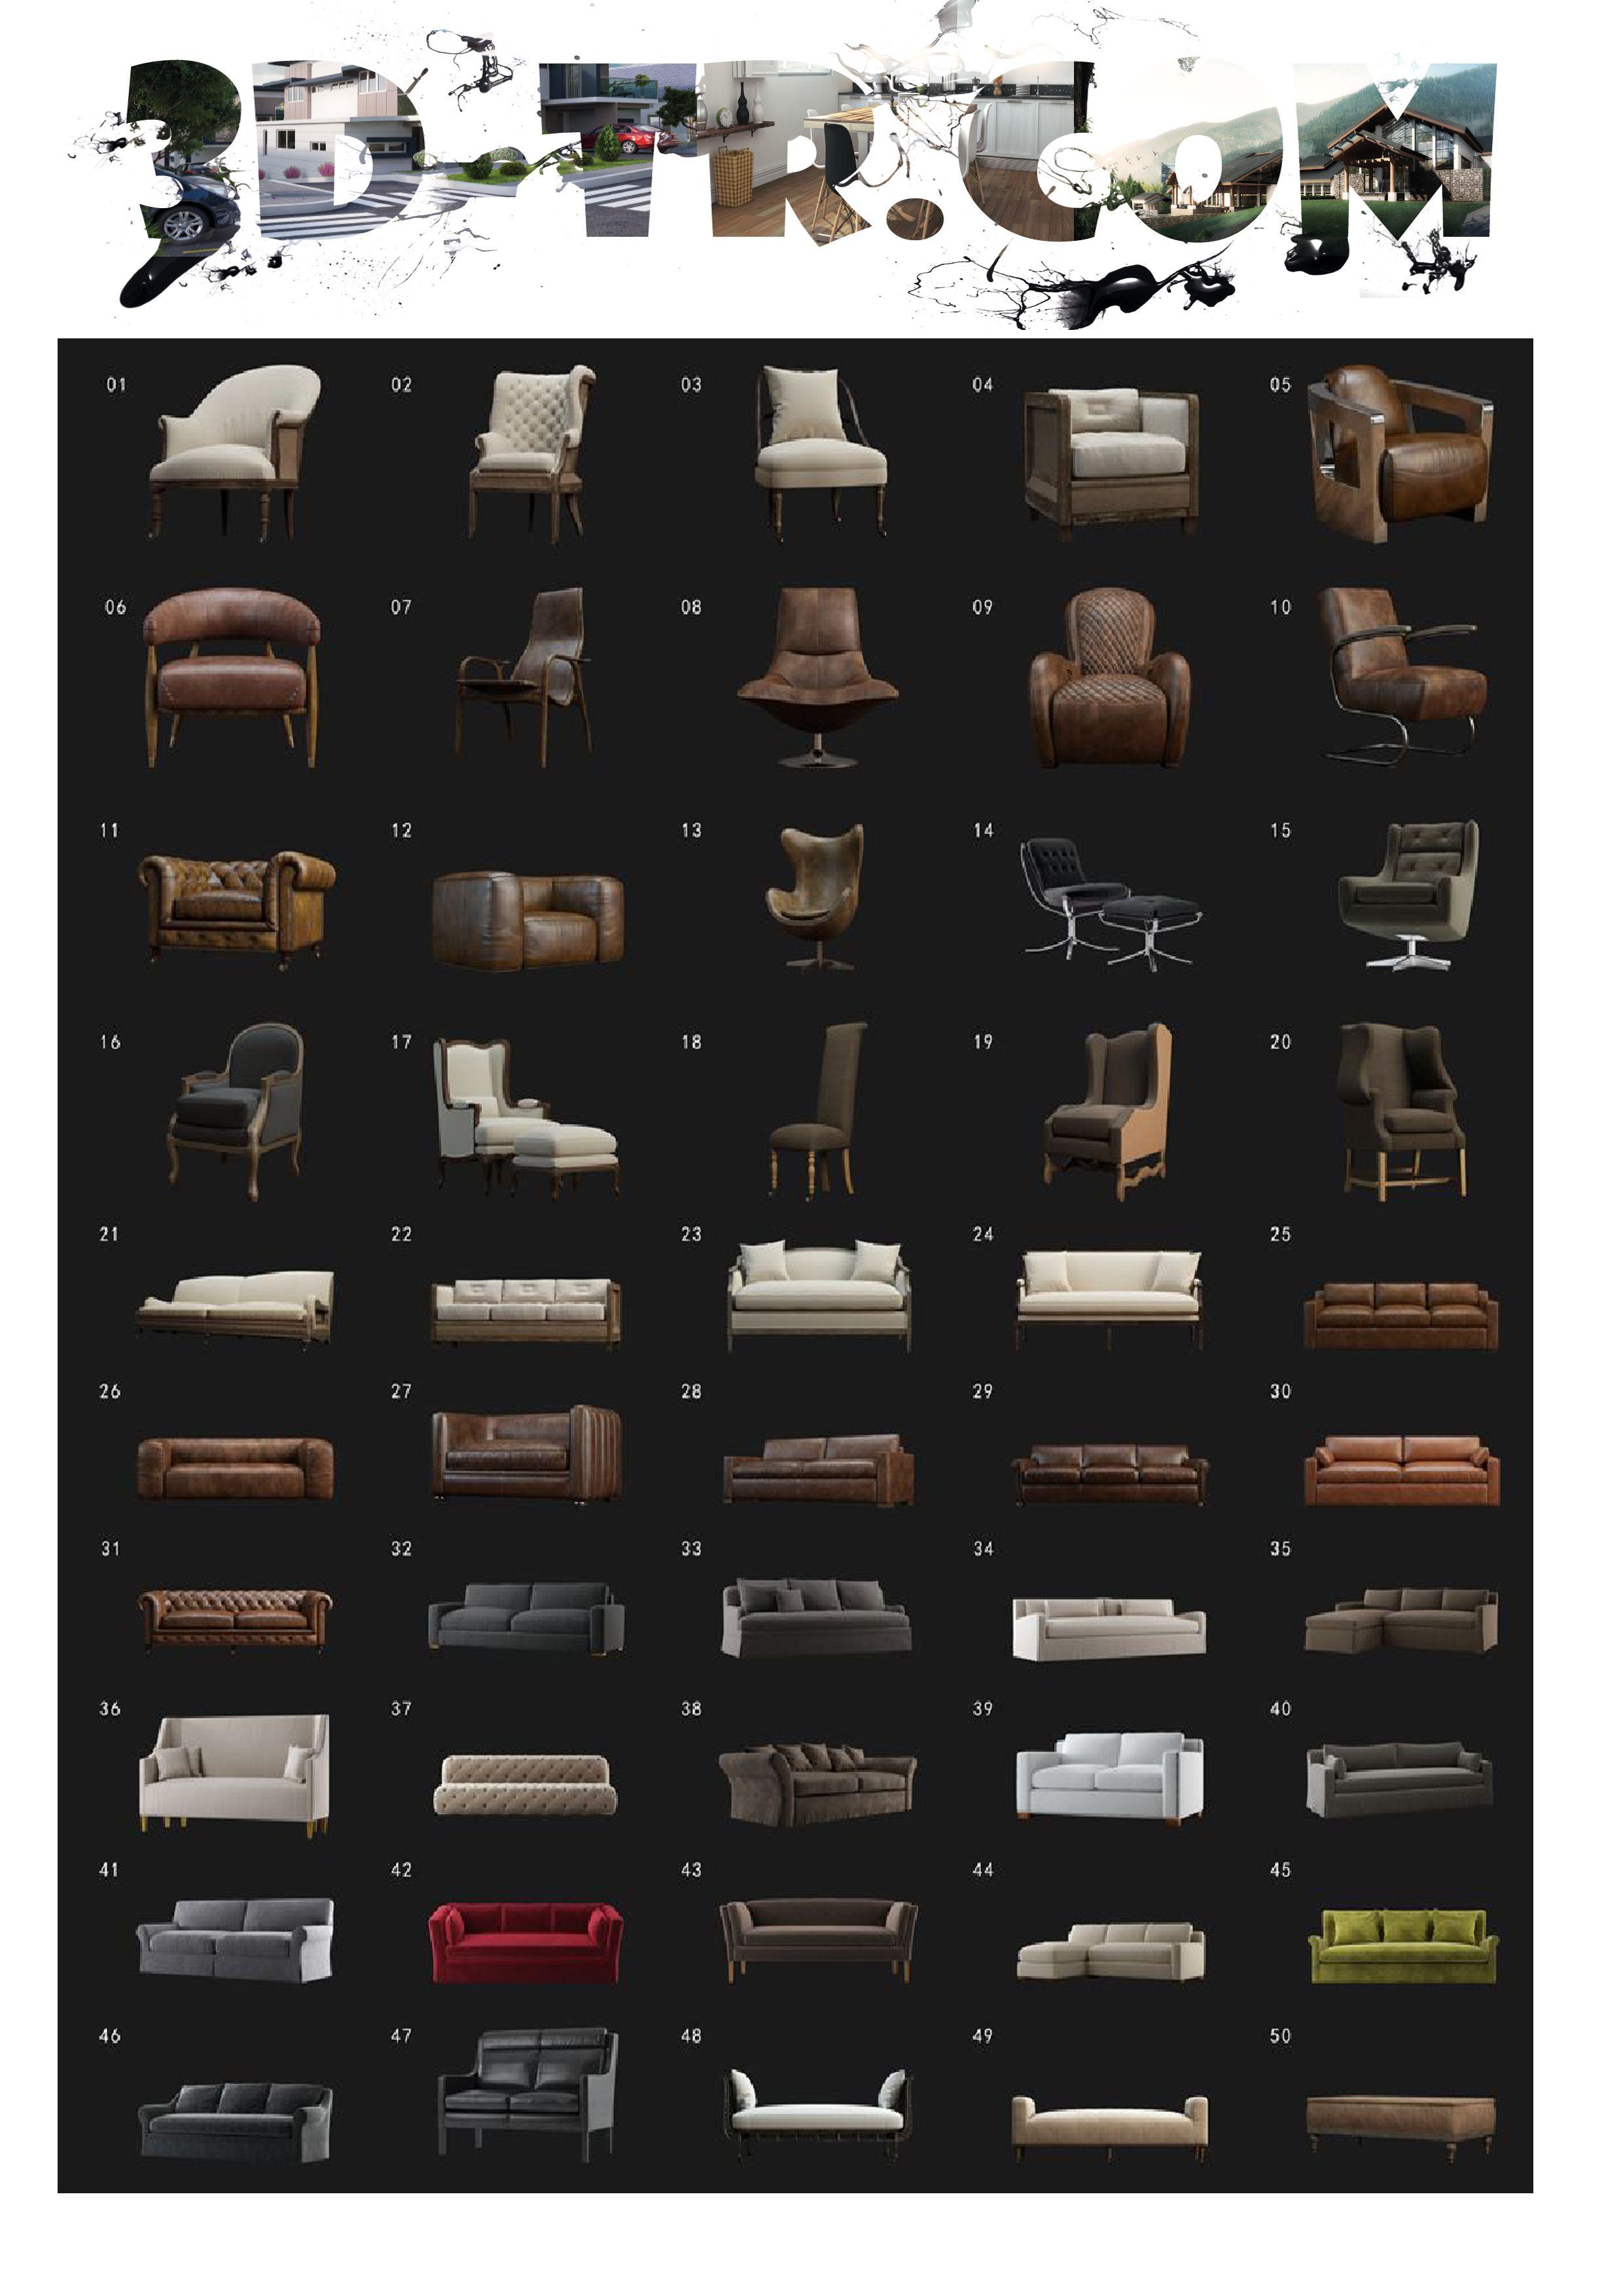 50 Adet Koltuk Modeli Modelleme Tasarim Mimari